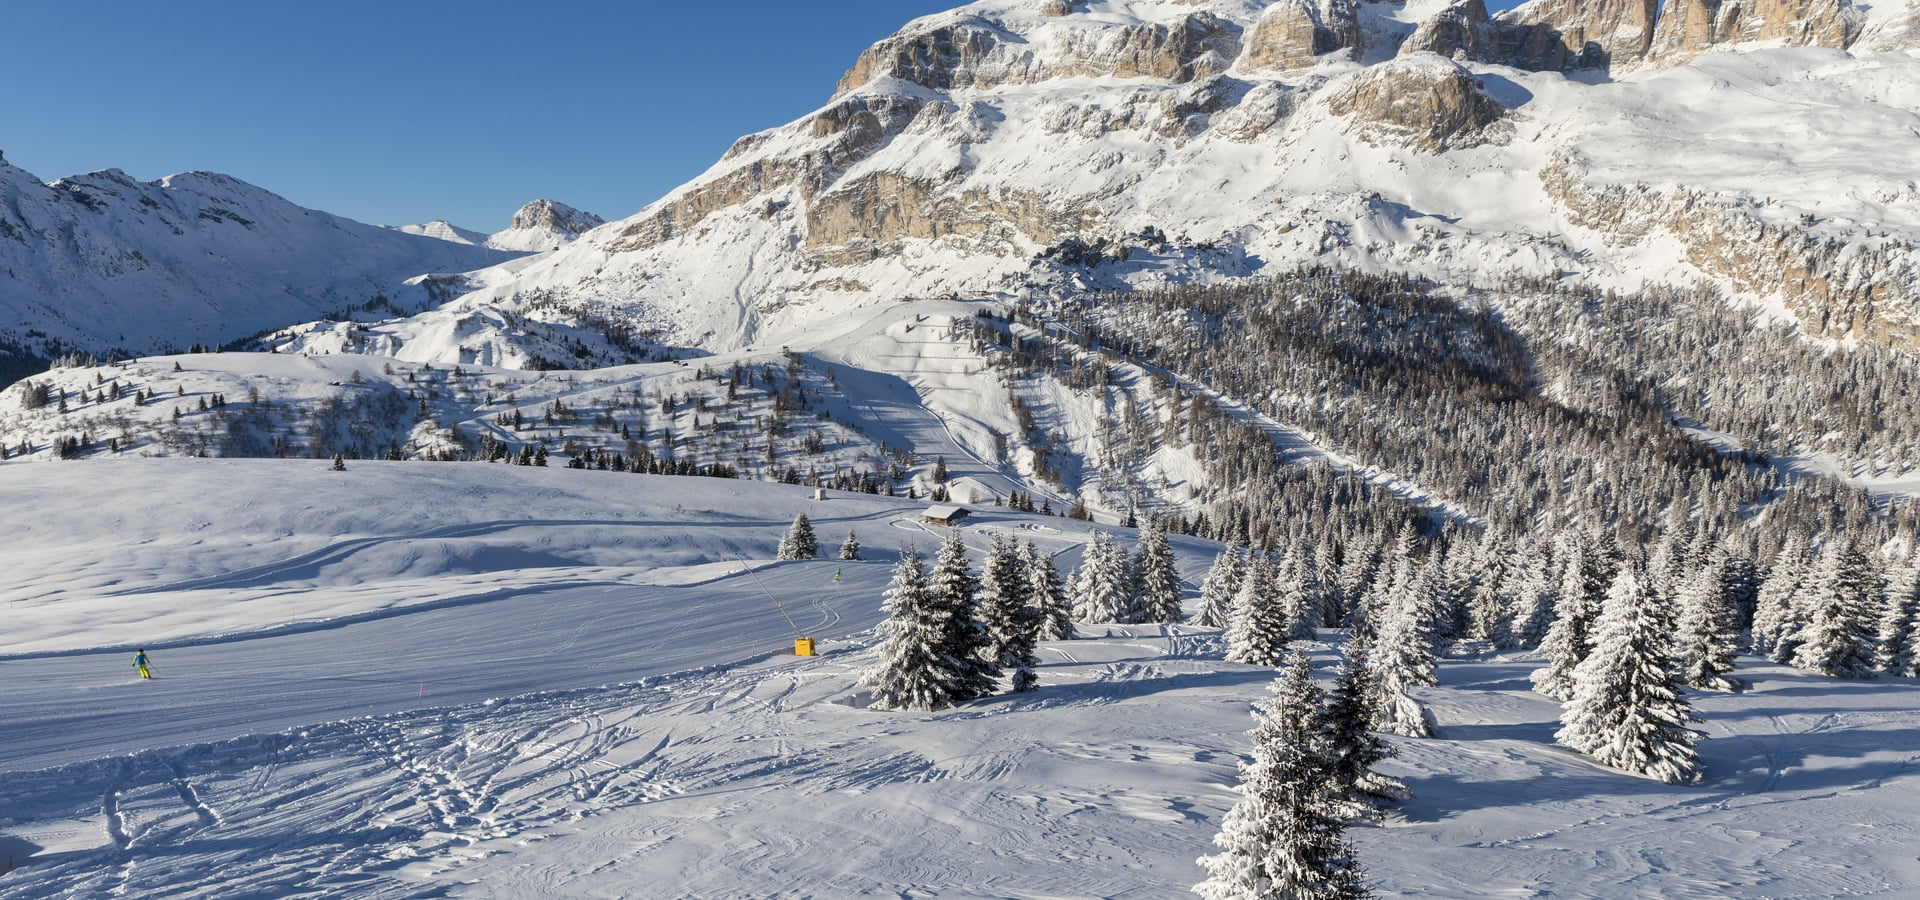 Winterurlaub 2020-21 in den Arabba-Dolomiten